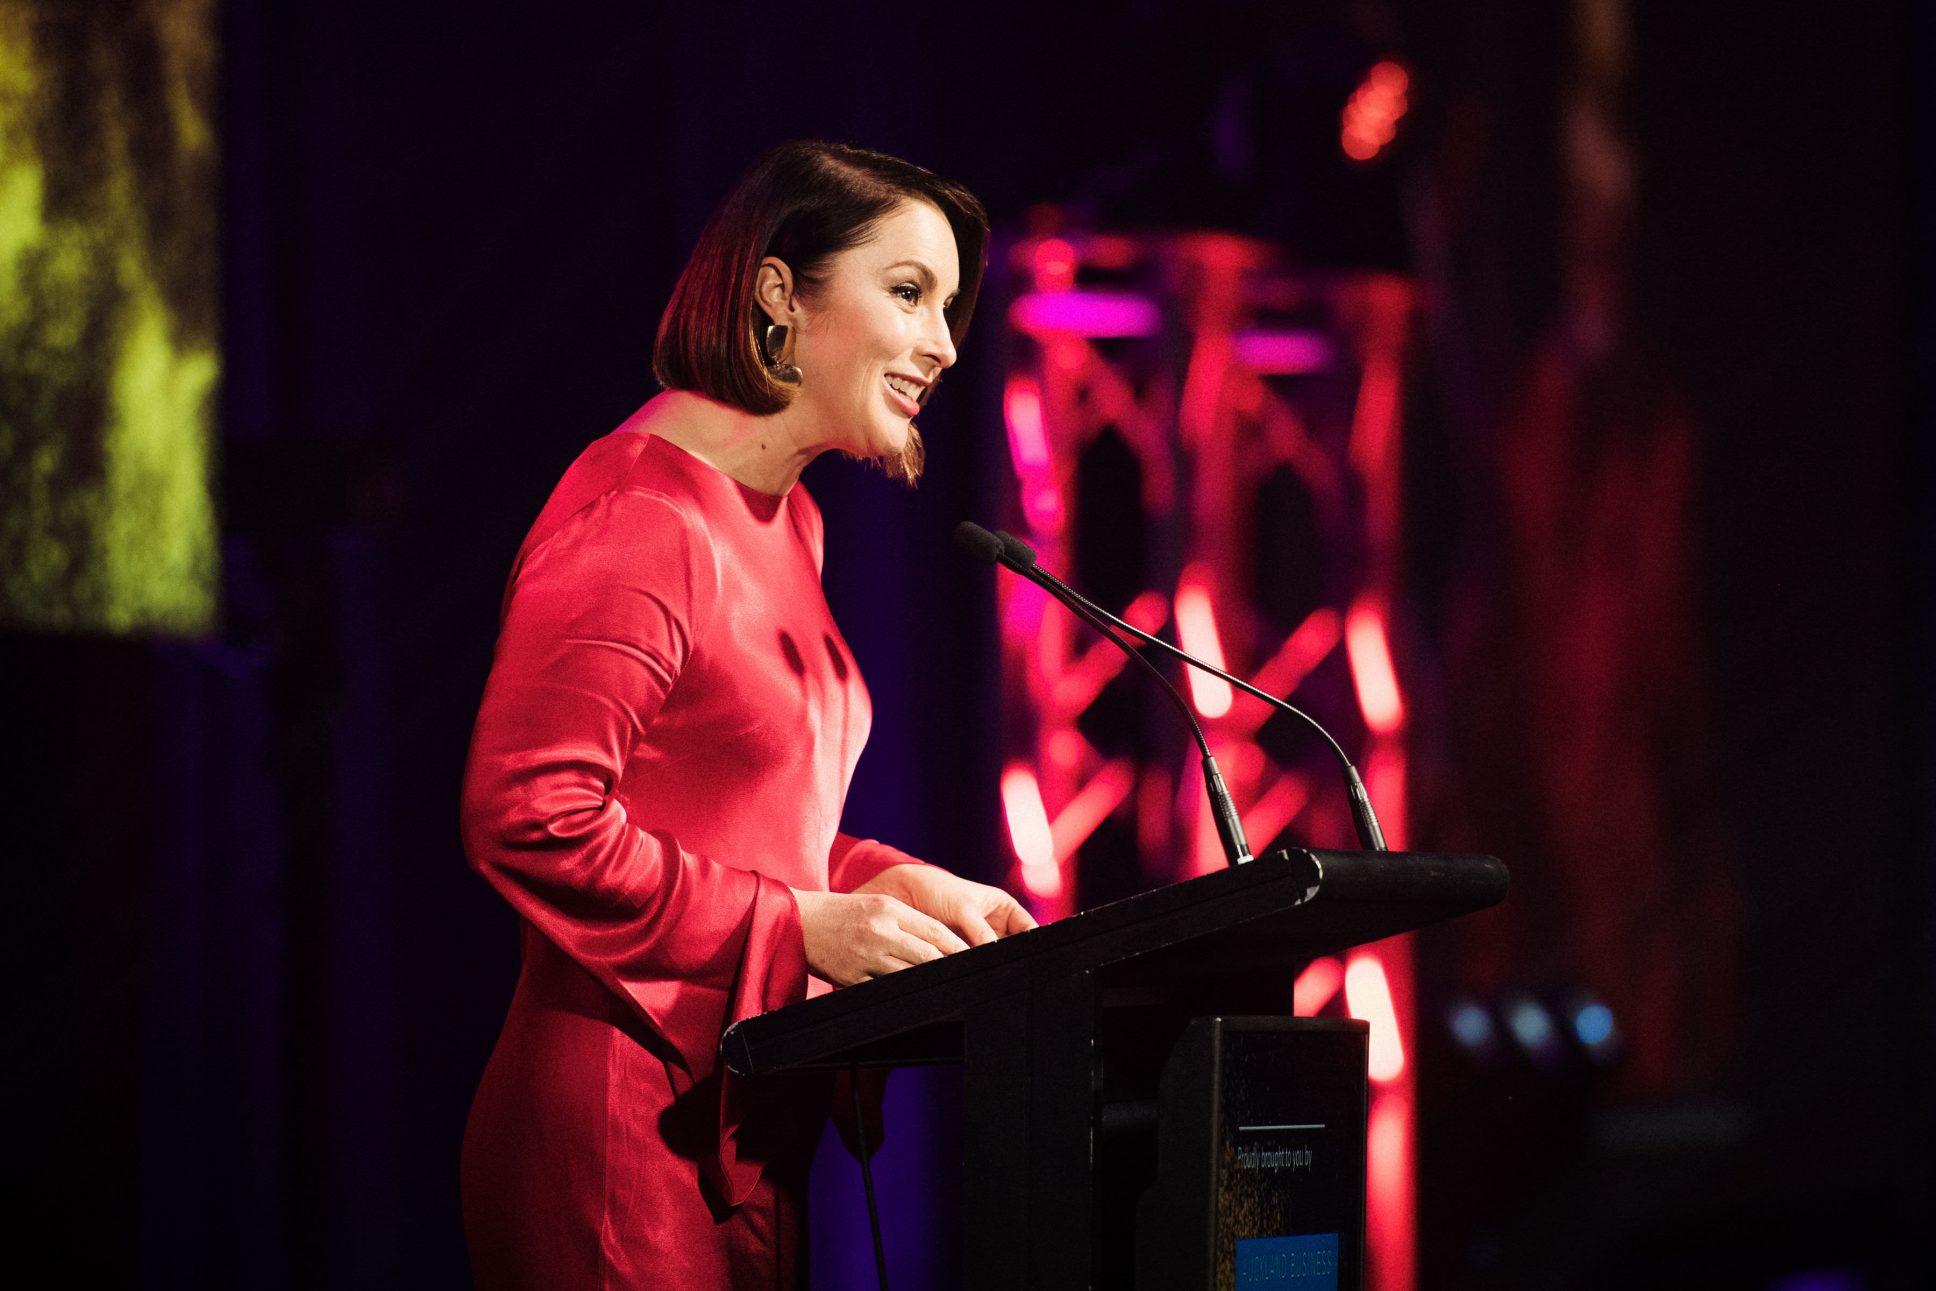 Westpac business awards speaker on stage